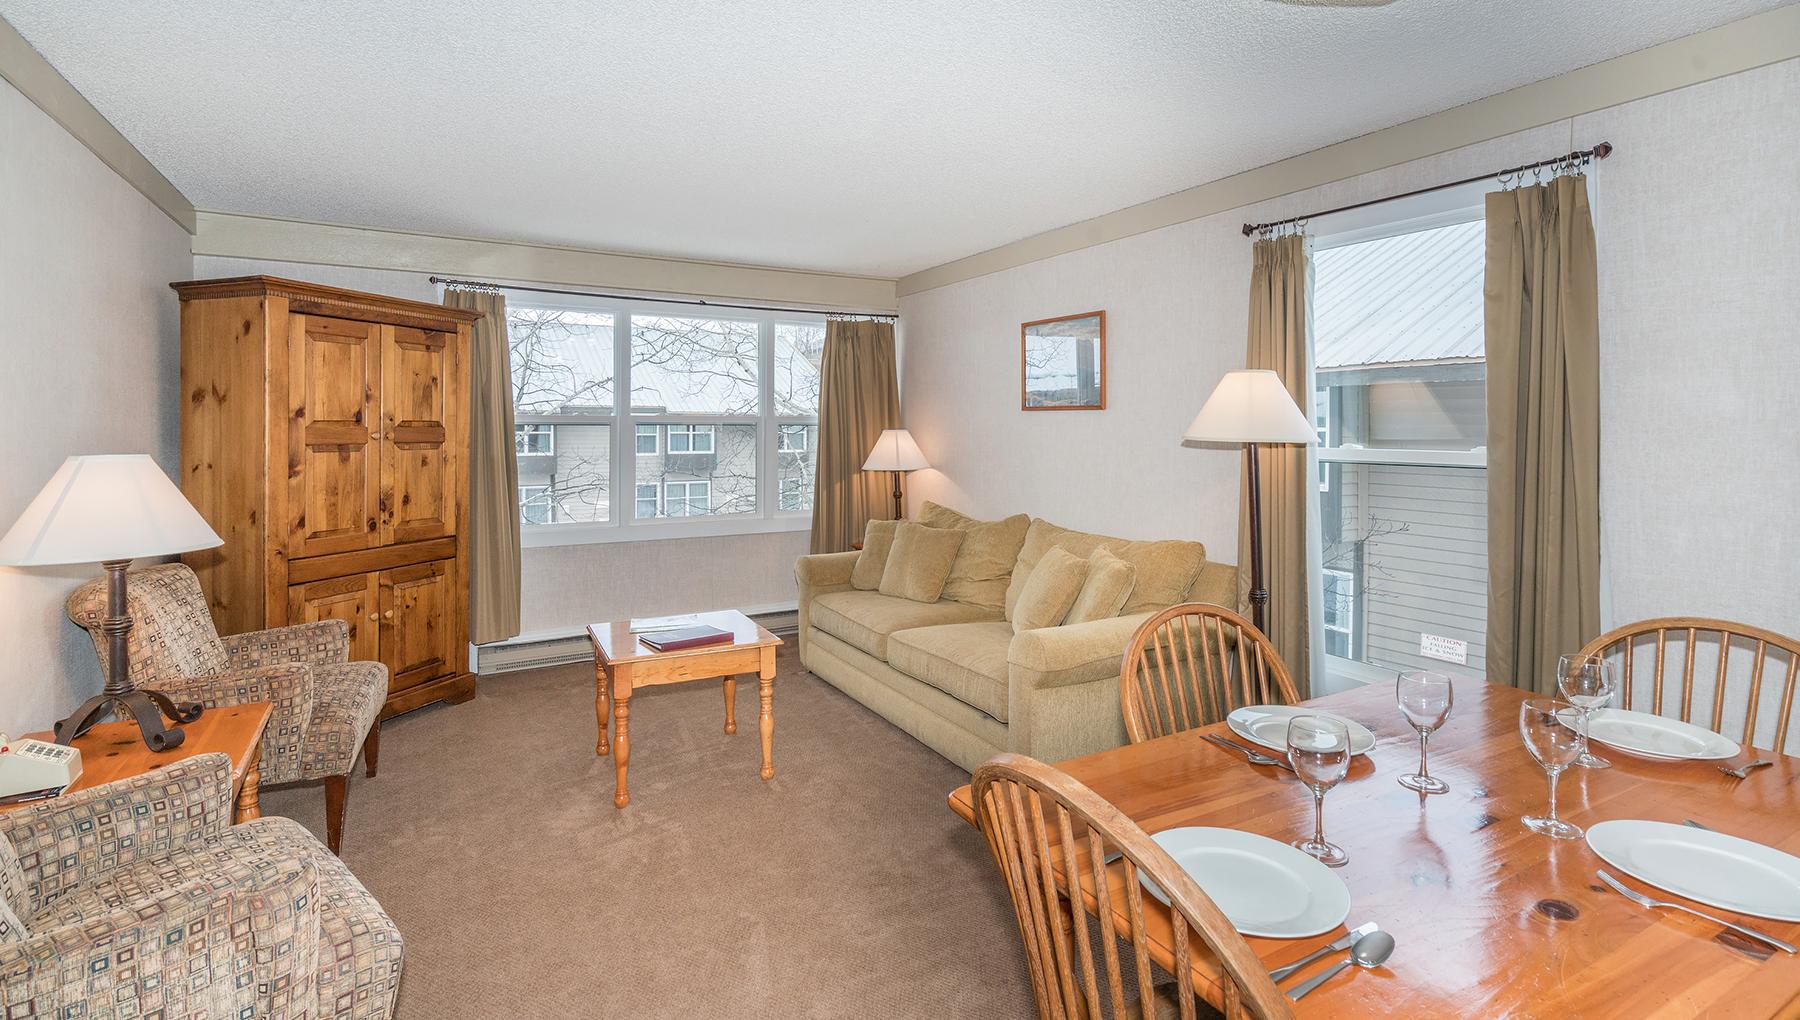 Viking Lodge 212 Hotel - room photo 7739187